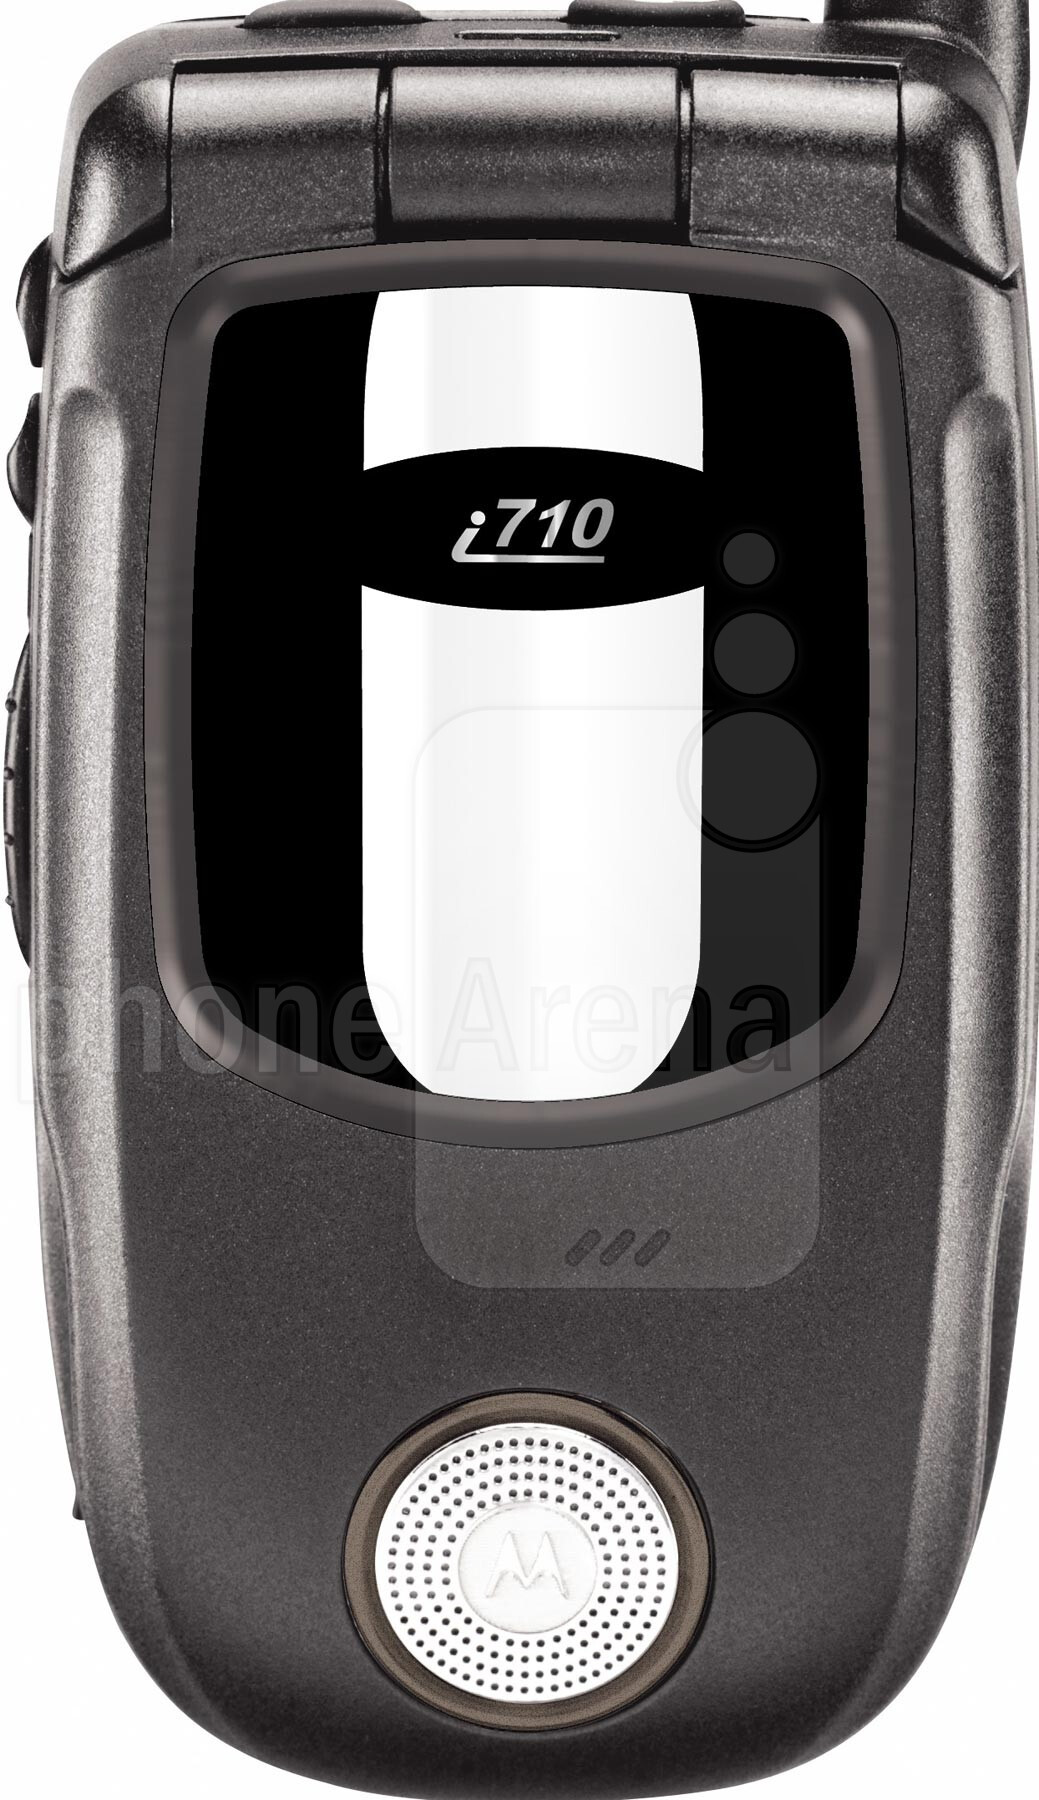 Motorola i710 Size - Real life visualization and comparison